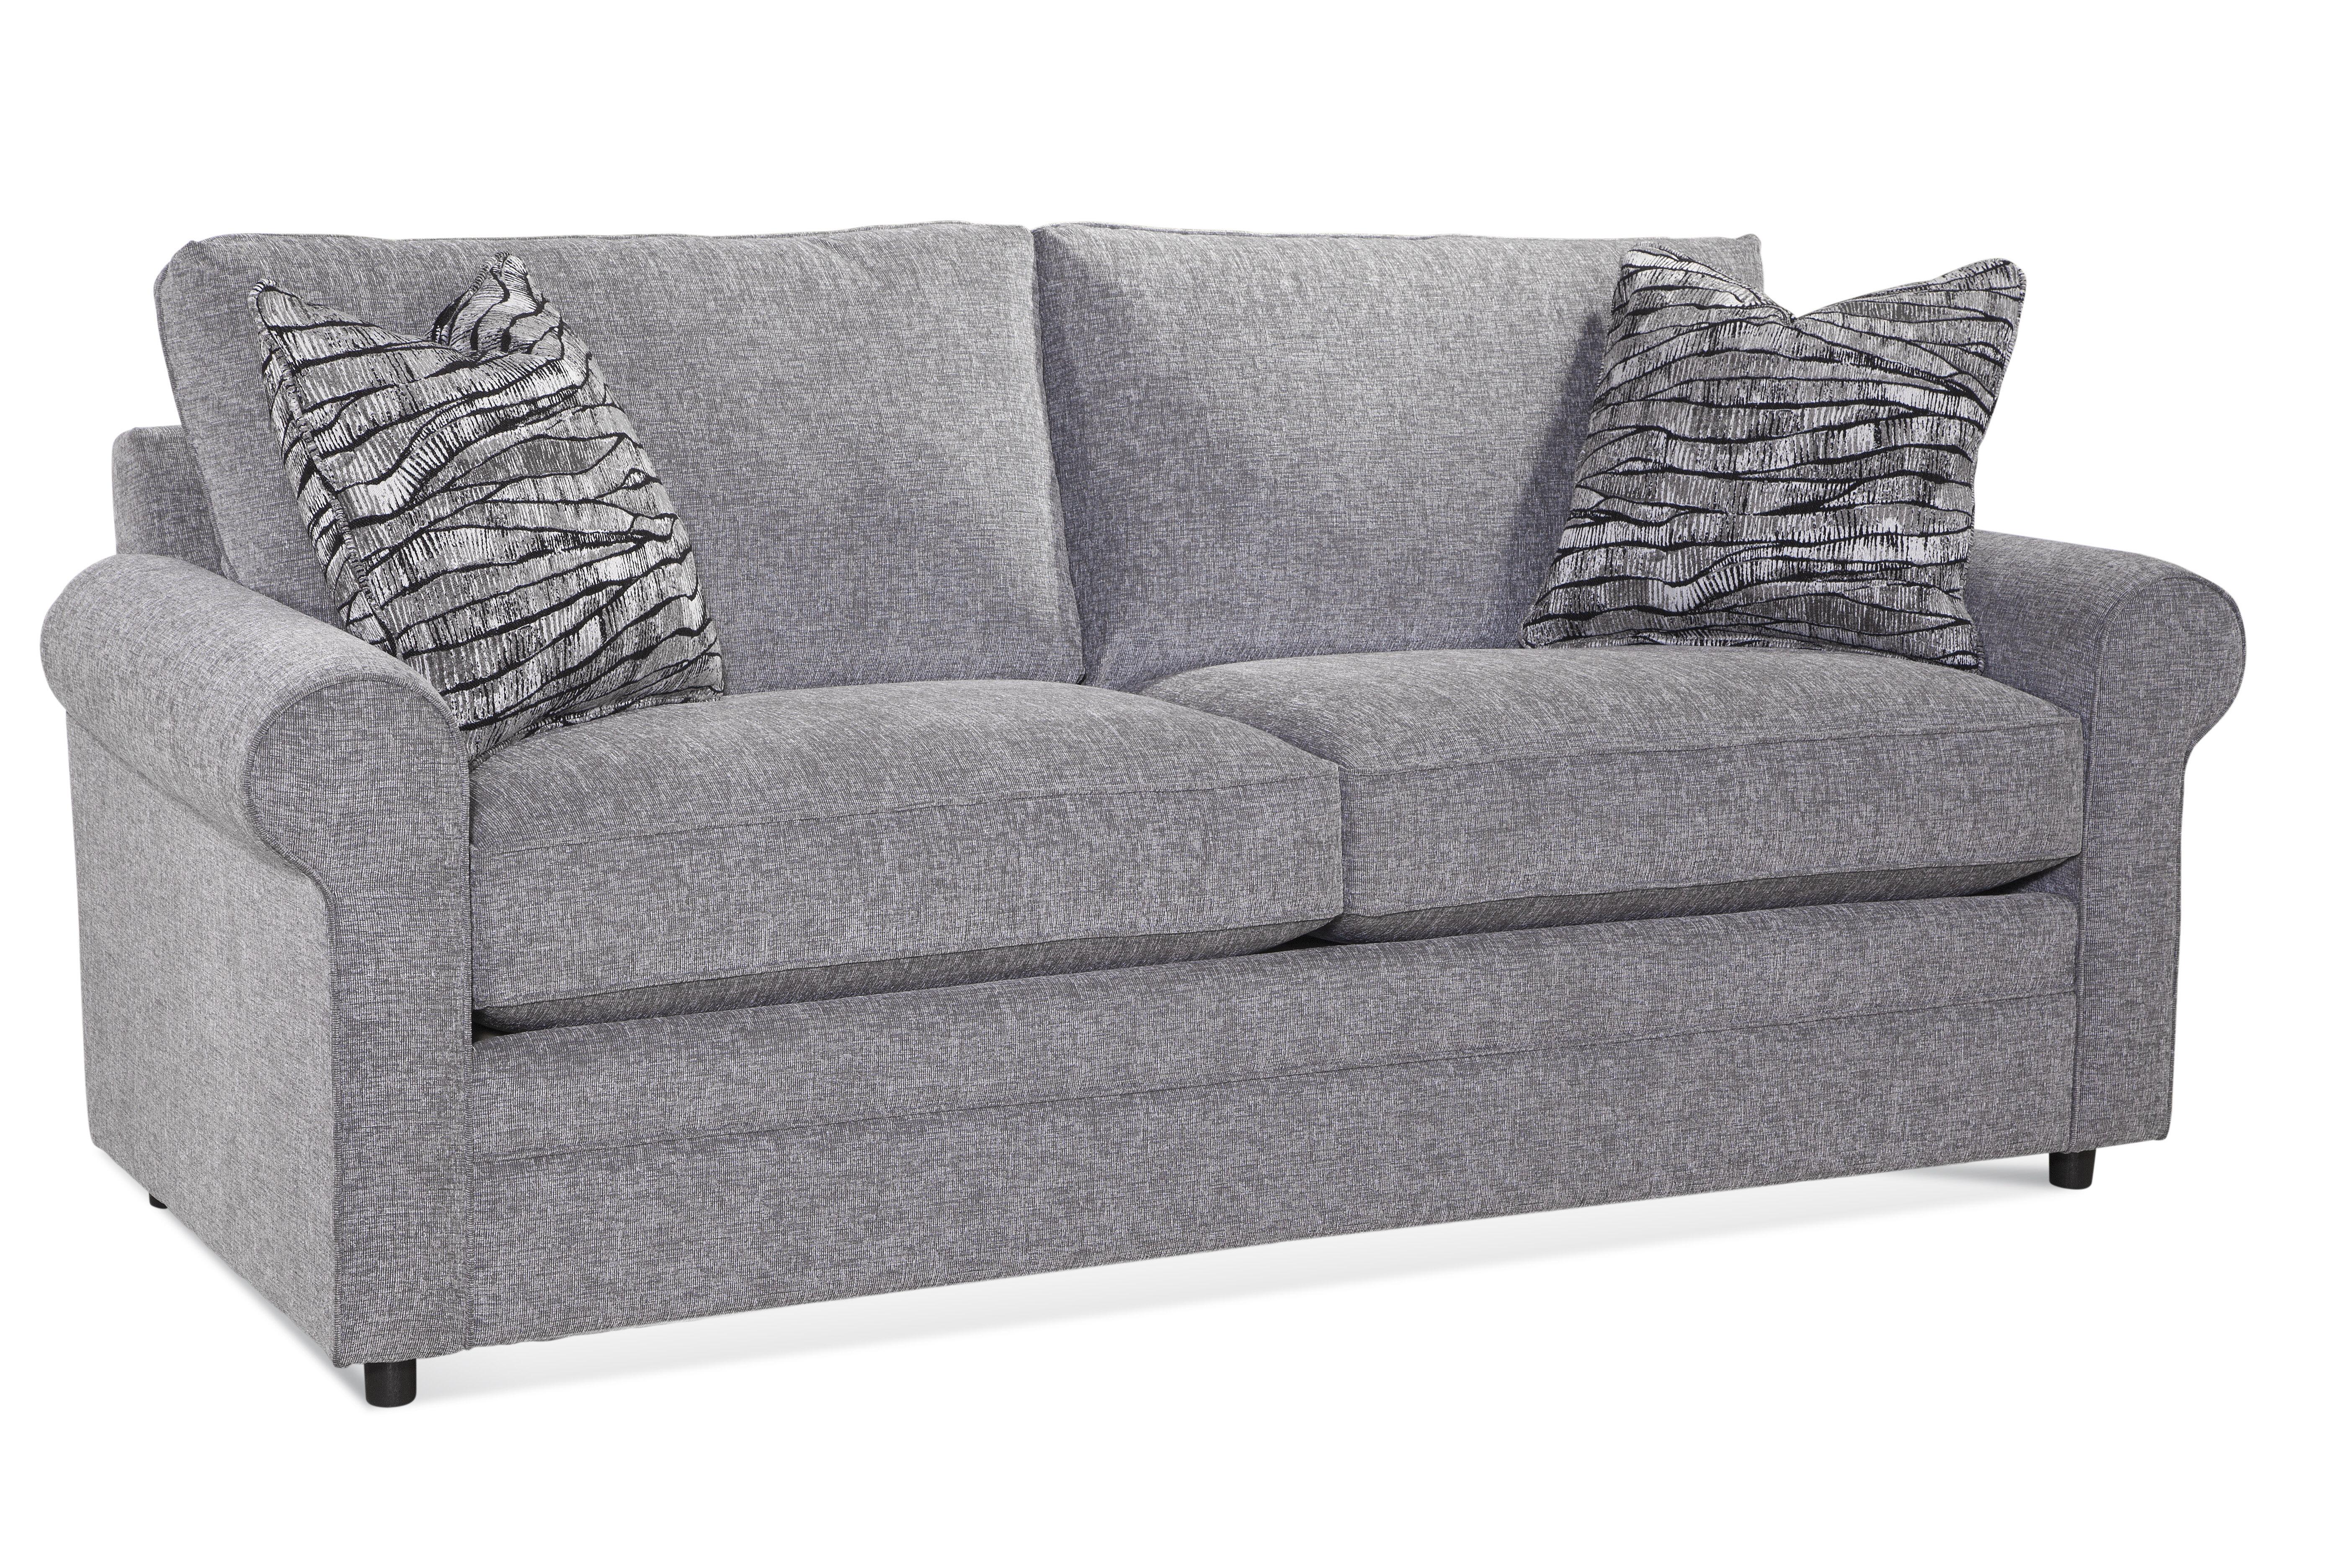 braxton culler edgeworth 85 rolled arm sofa bed bxcl1746 piid=